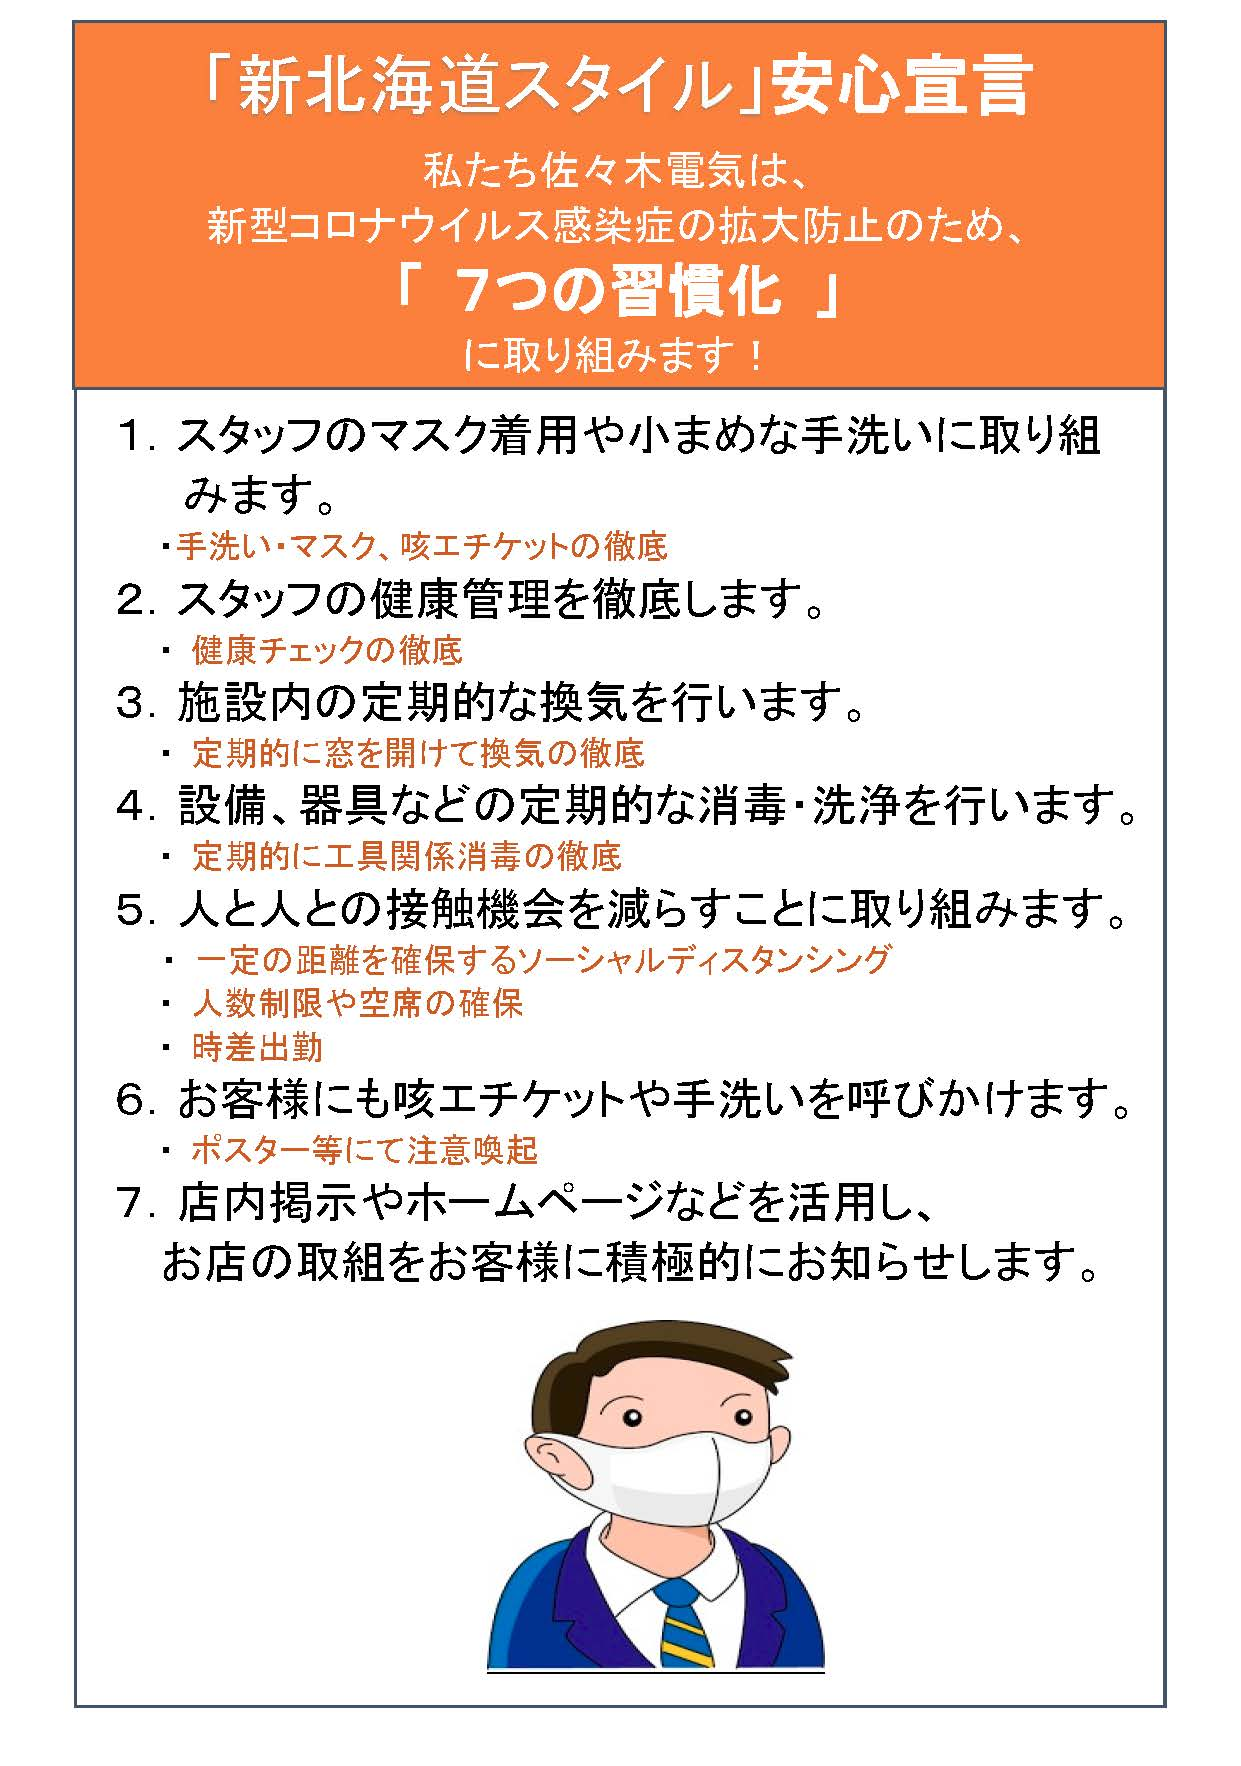 shinhokkaidostyleyoushiki-1